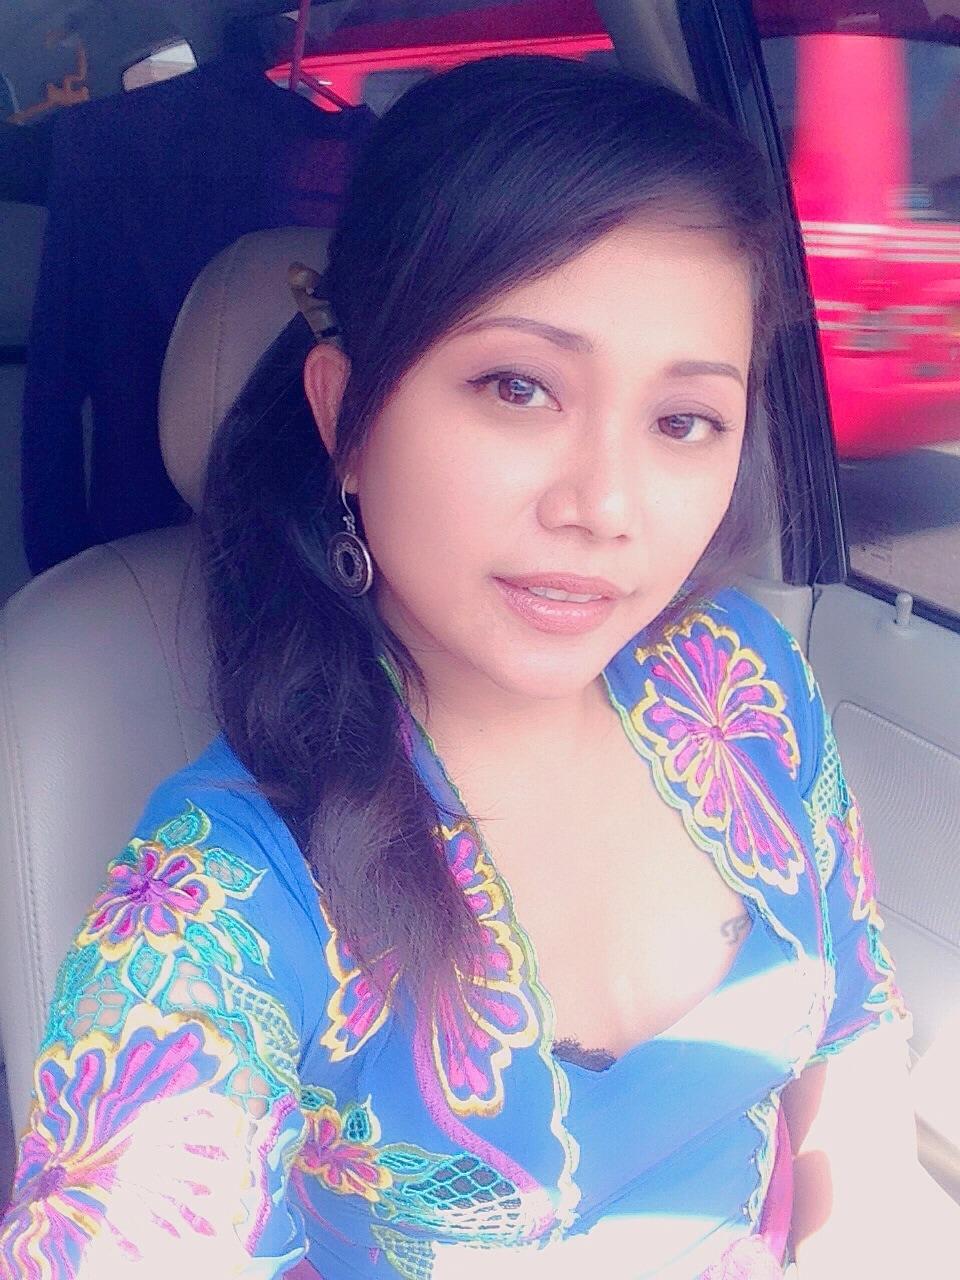 Linda From Ubud, Indonesia